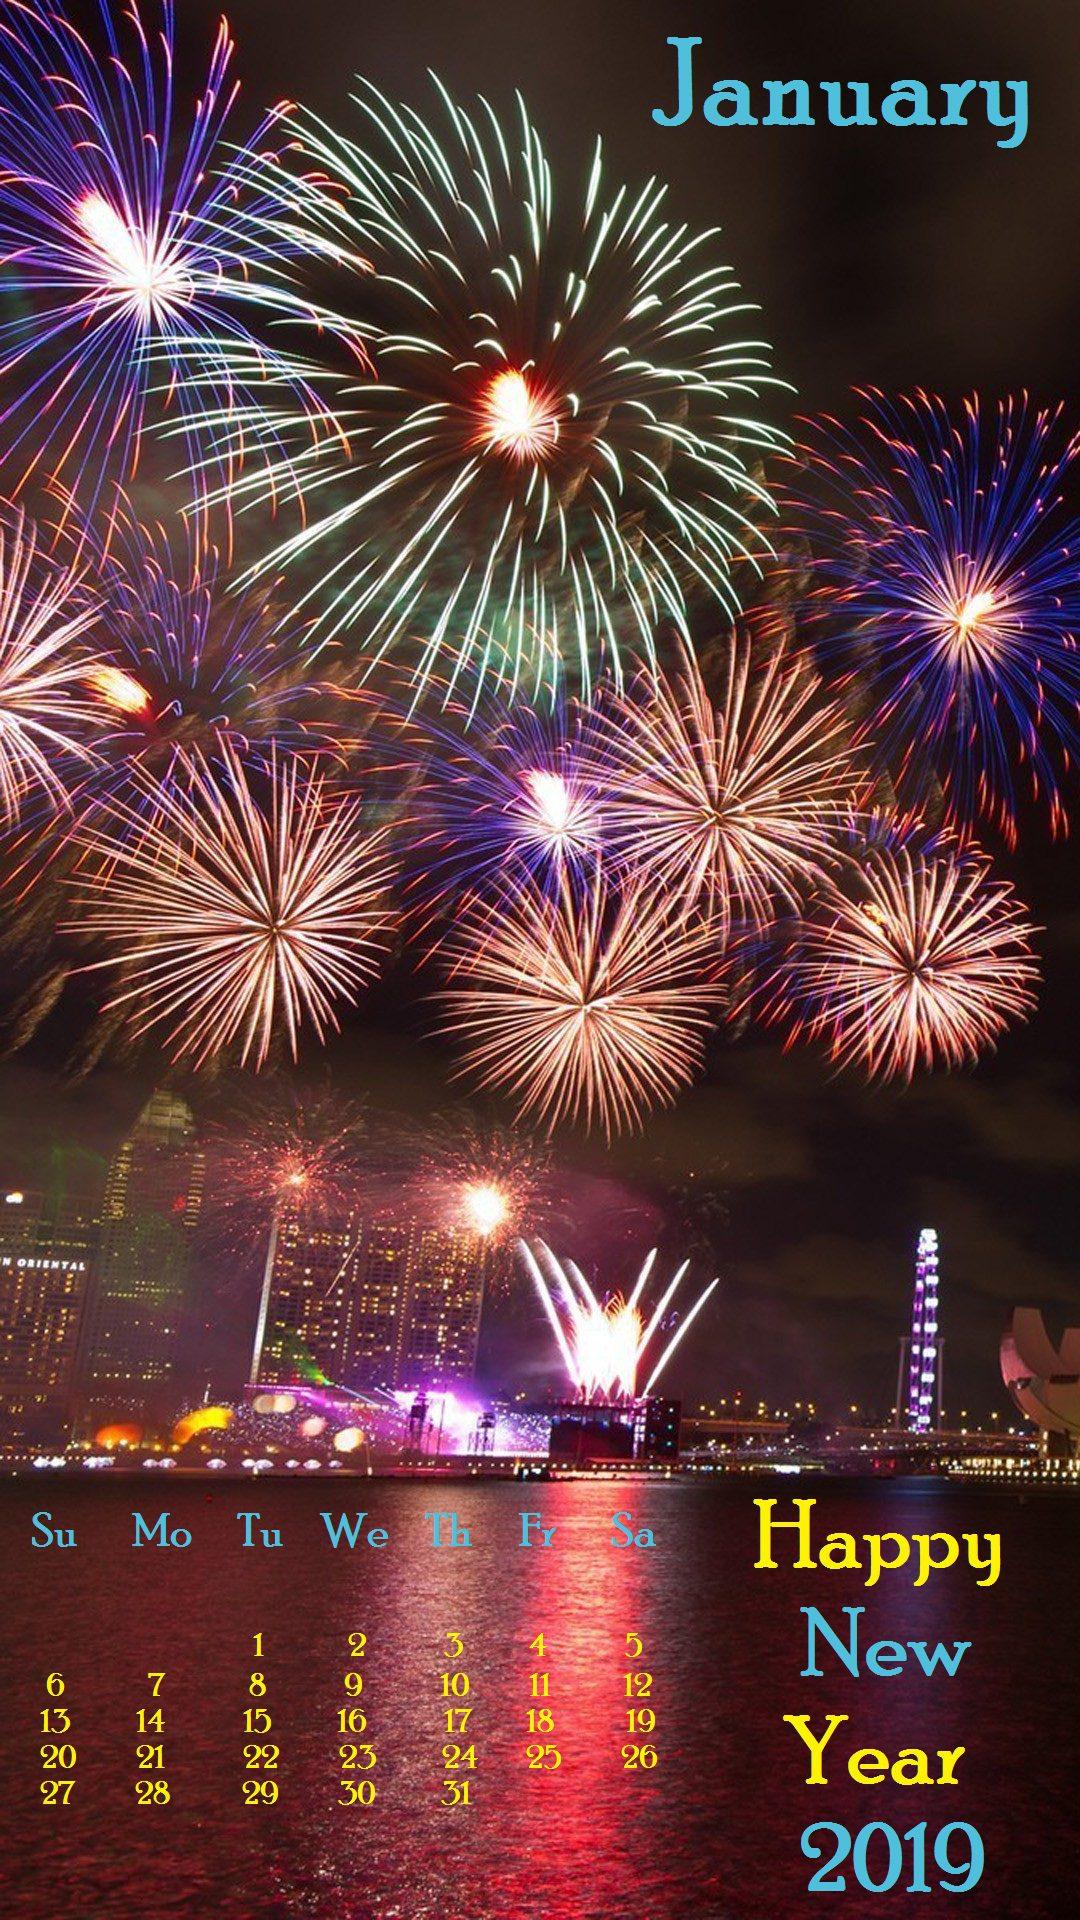 Fireworks January 2019 iPhone Calendar Wallpaper